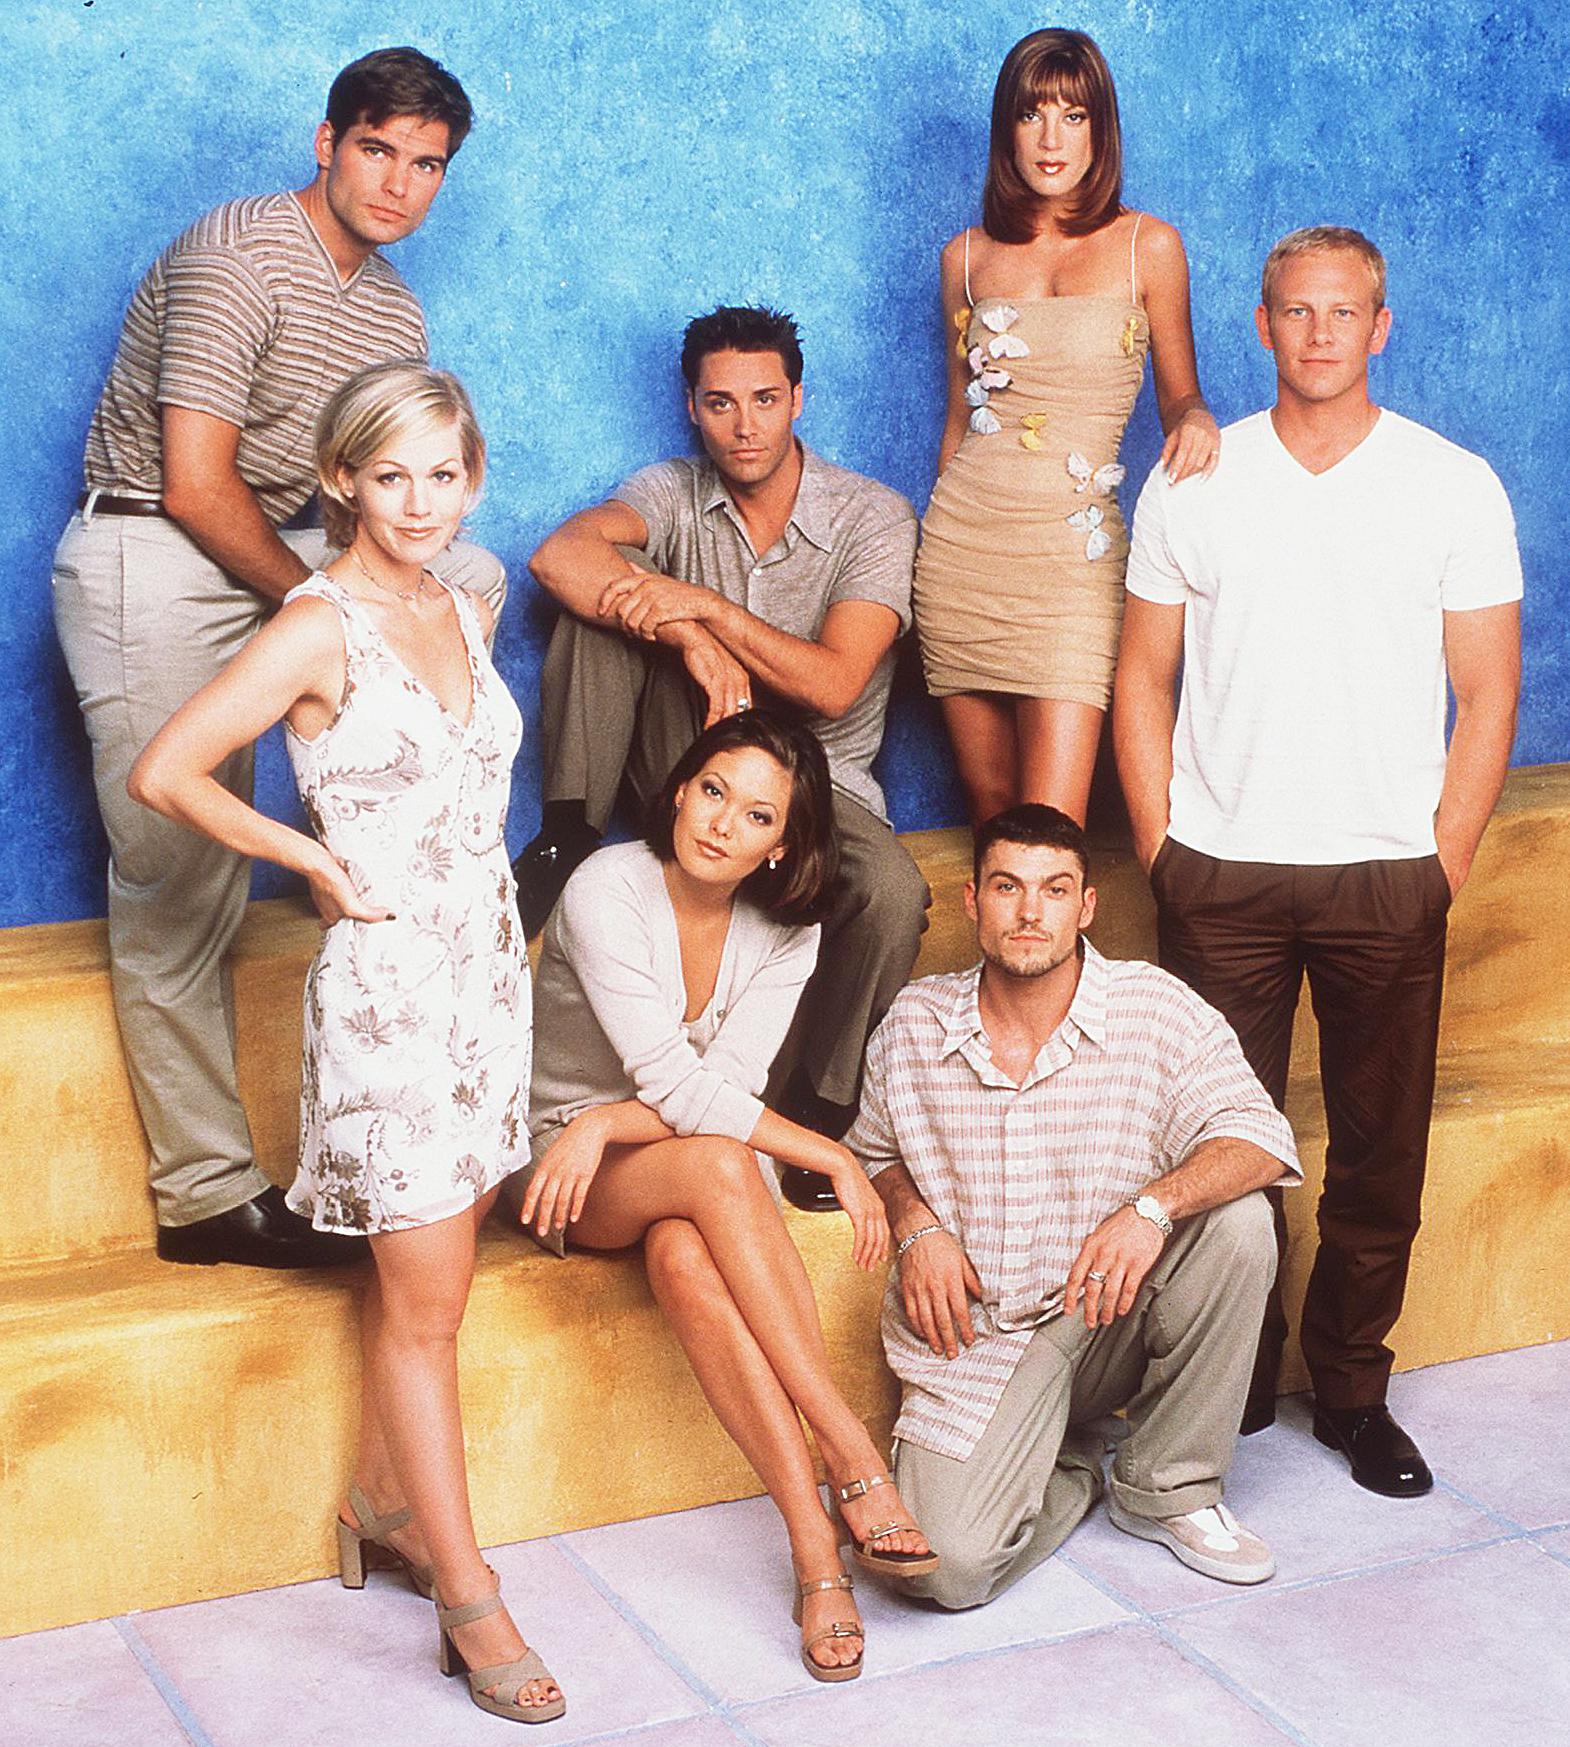 Beverly Hills 90210 Ian Ziering Tori Spelling Sharknado